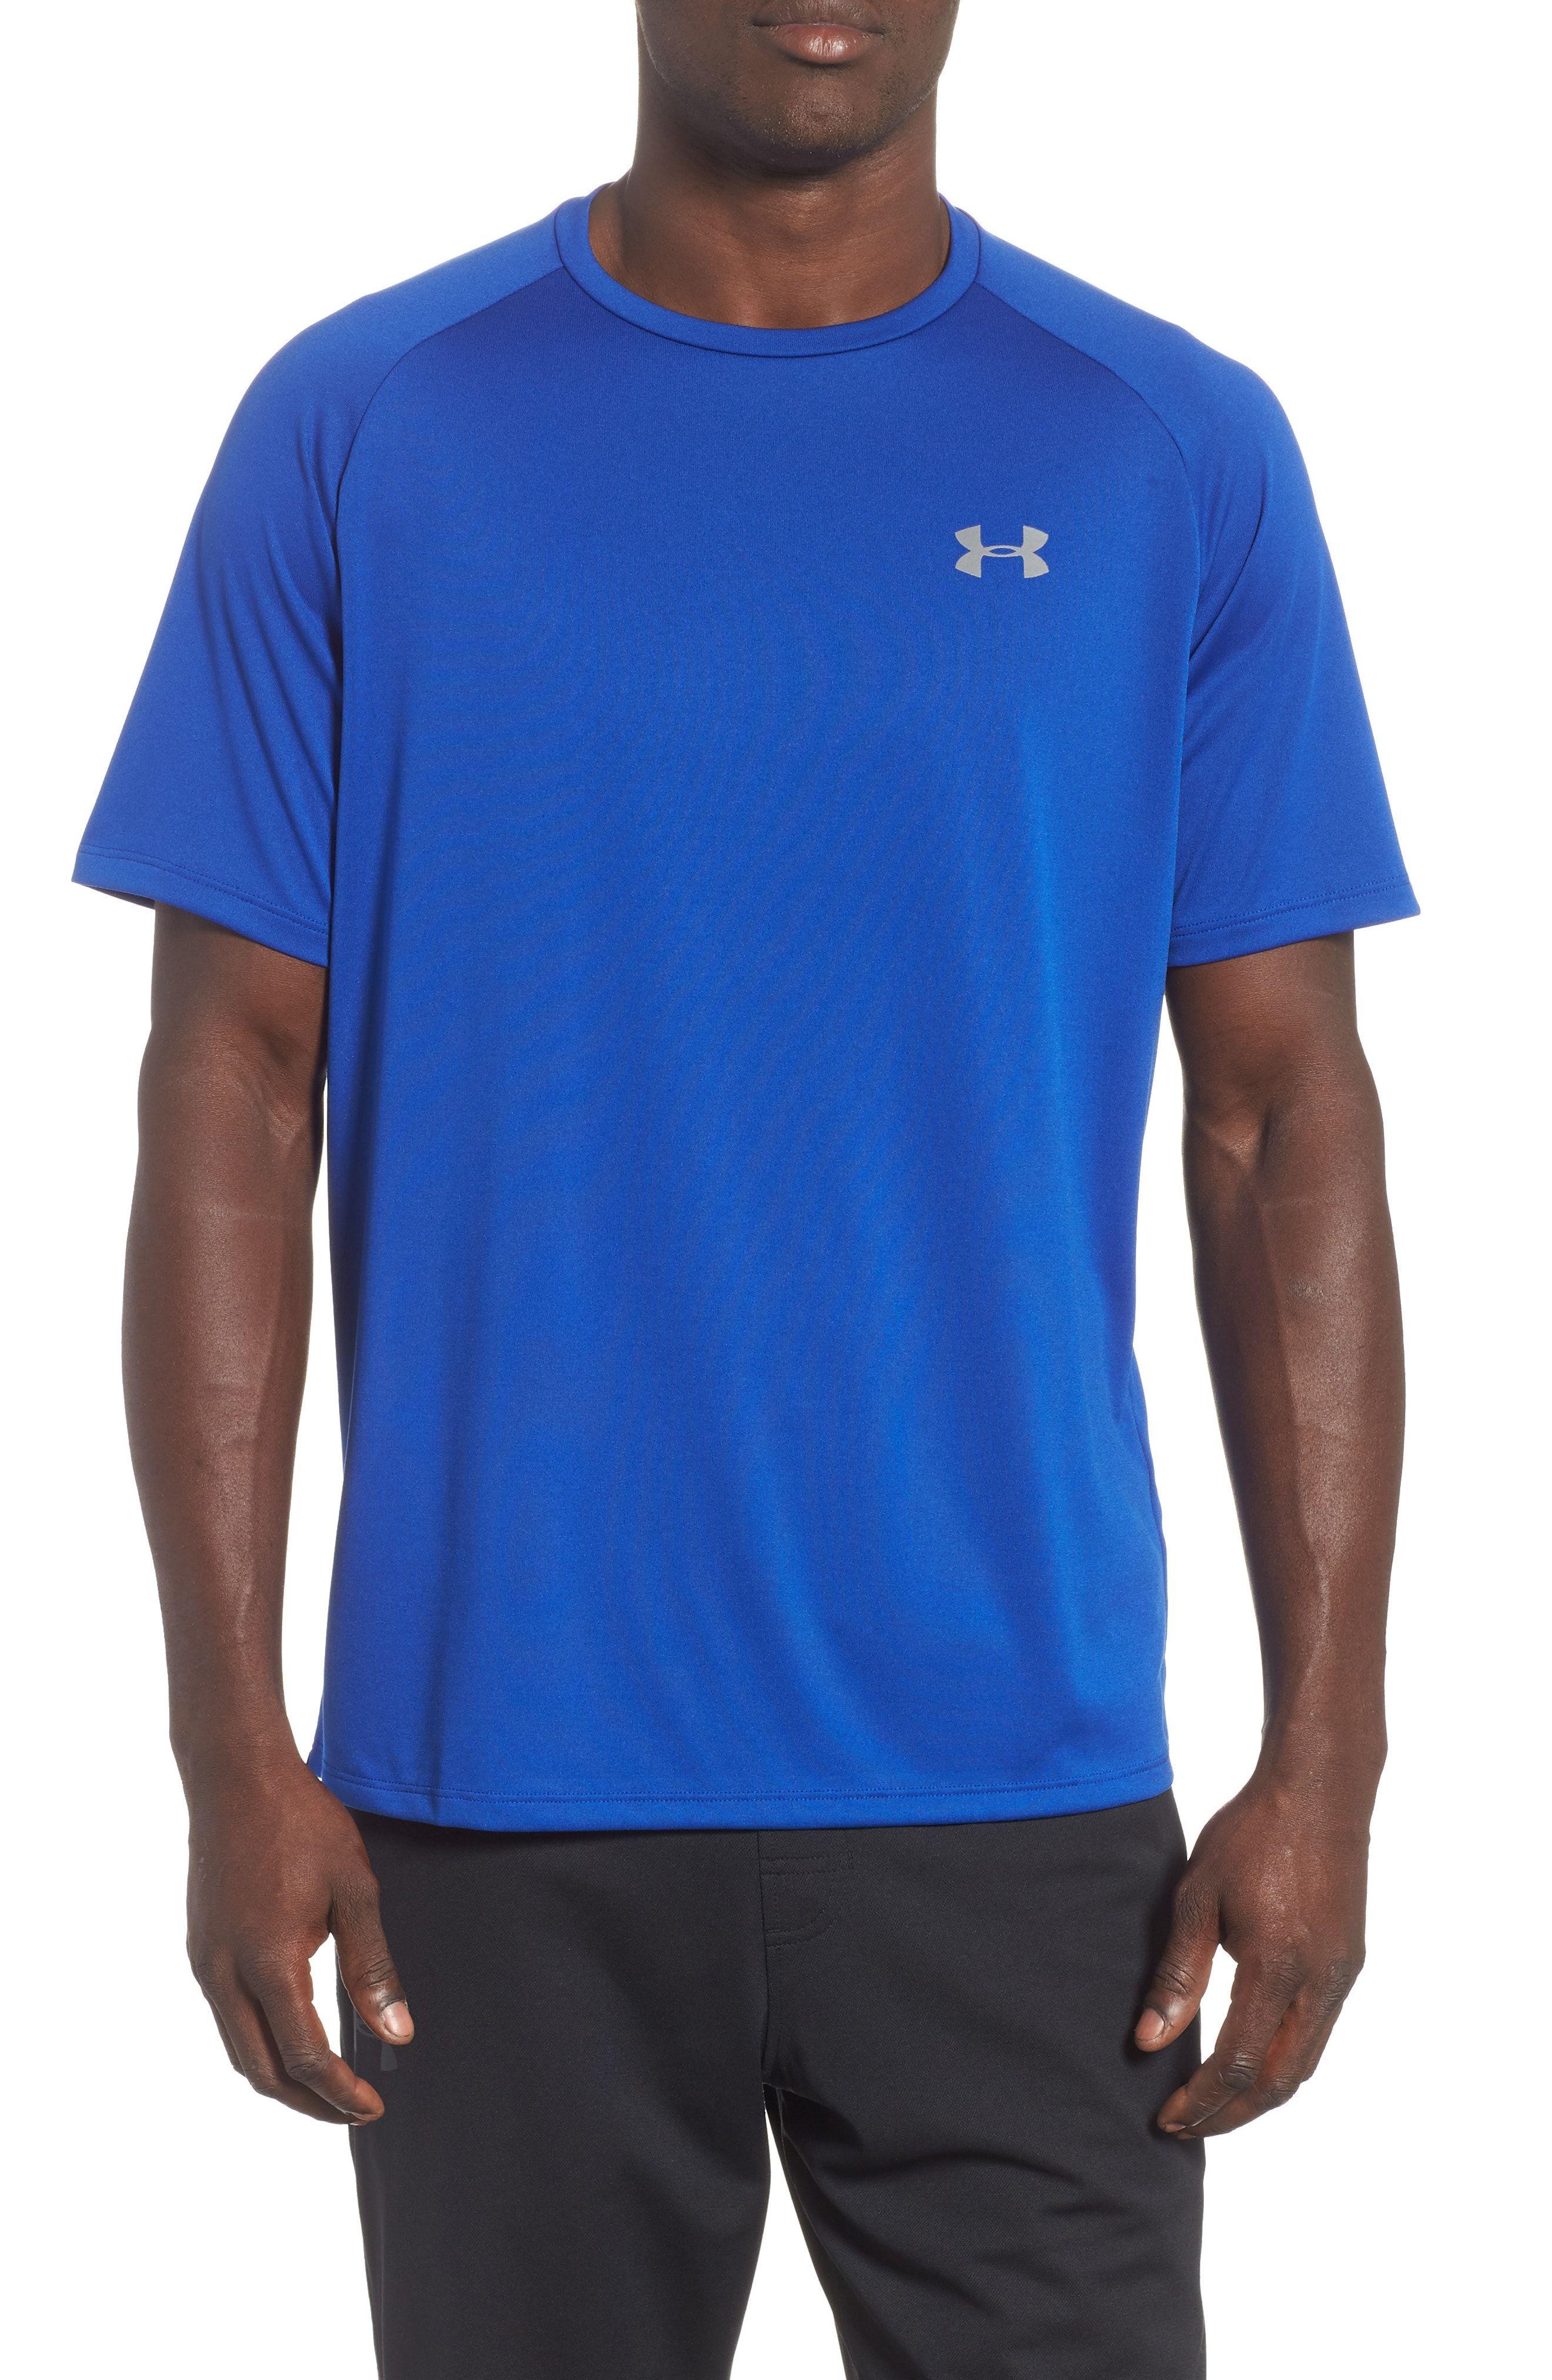 Under Armour UA Men/'s Loose Fit Heatgear Short Sleeve Athletic Tee T Shirt